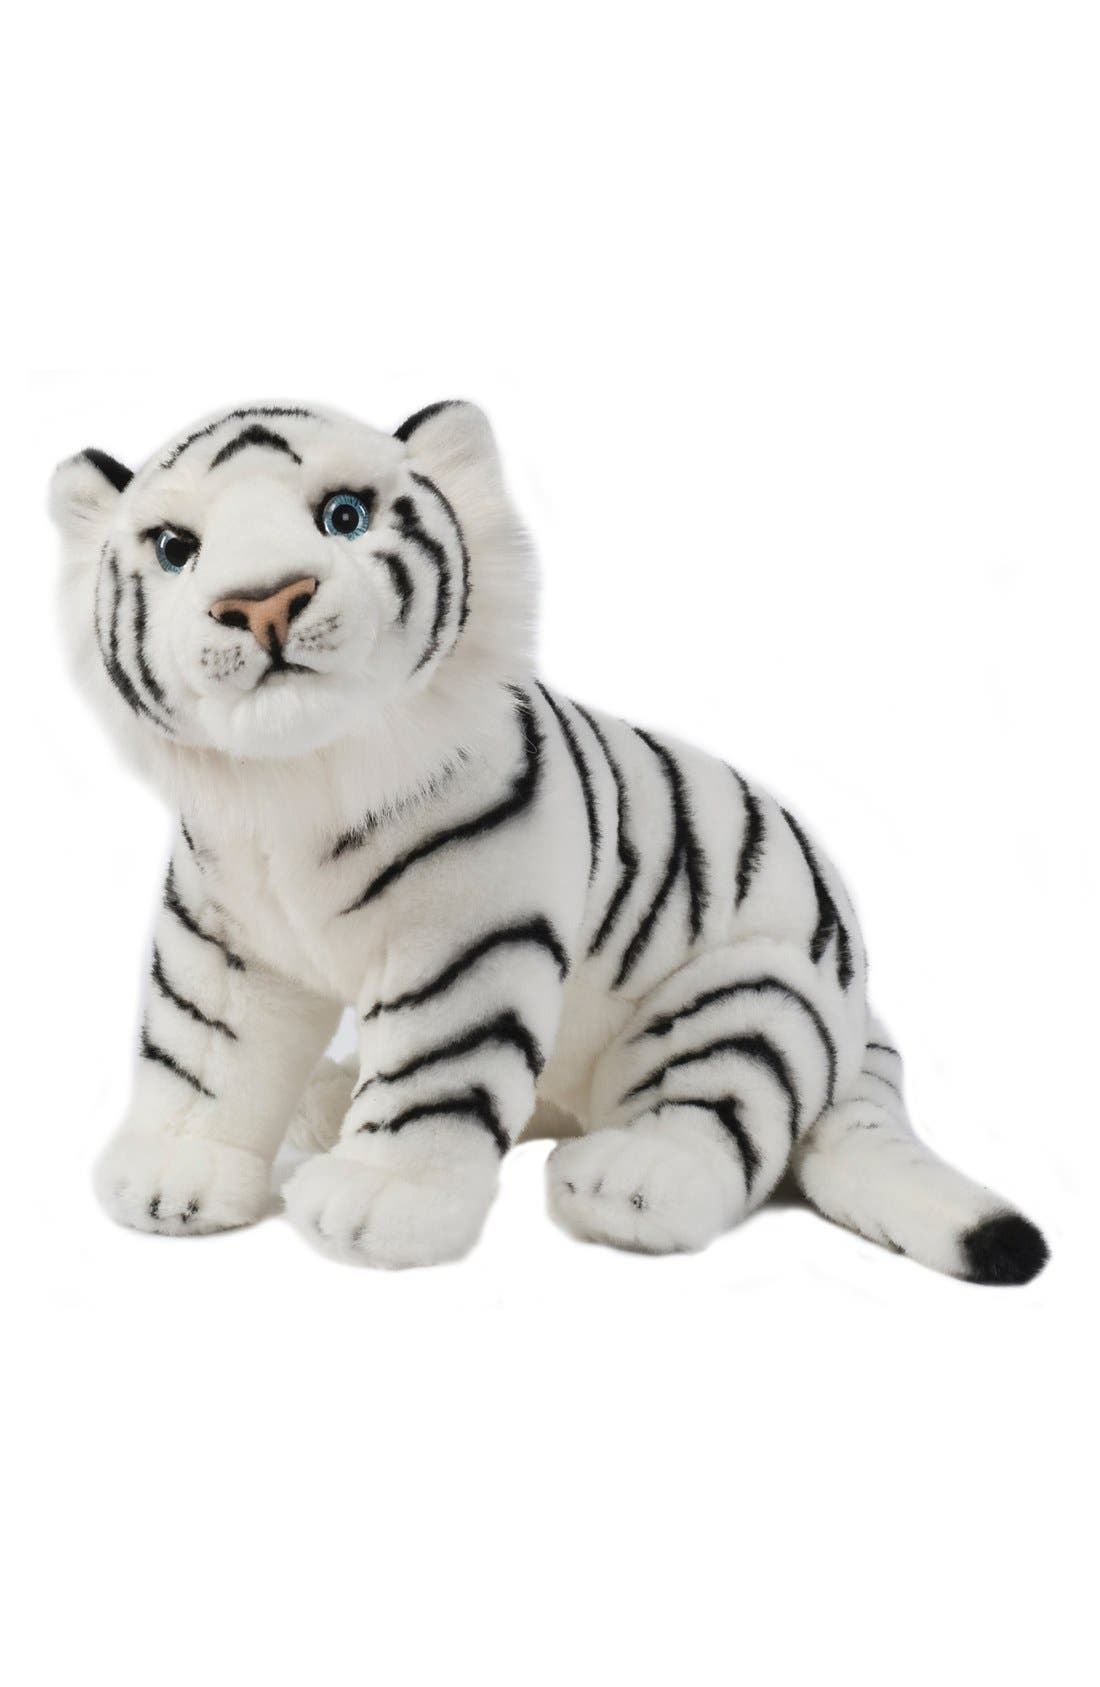 Aurora World Toys 'Sitting White Tiger' Stuffed Animal